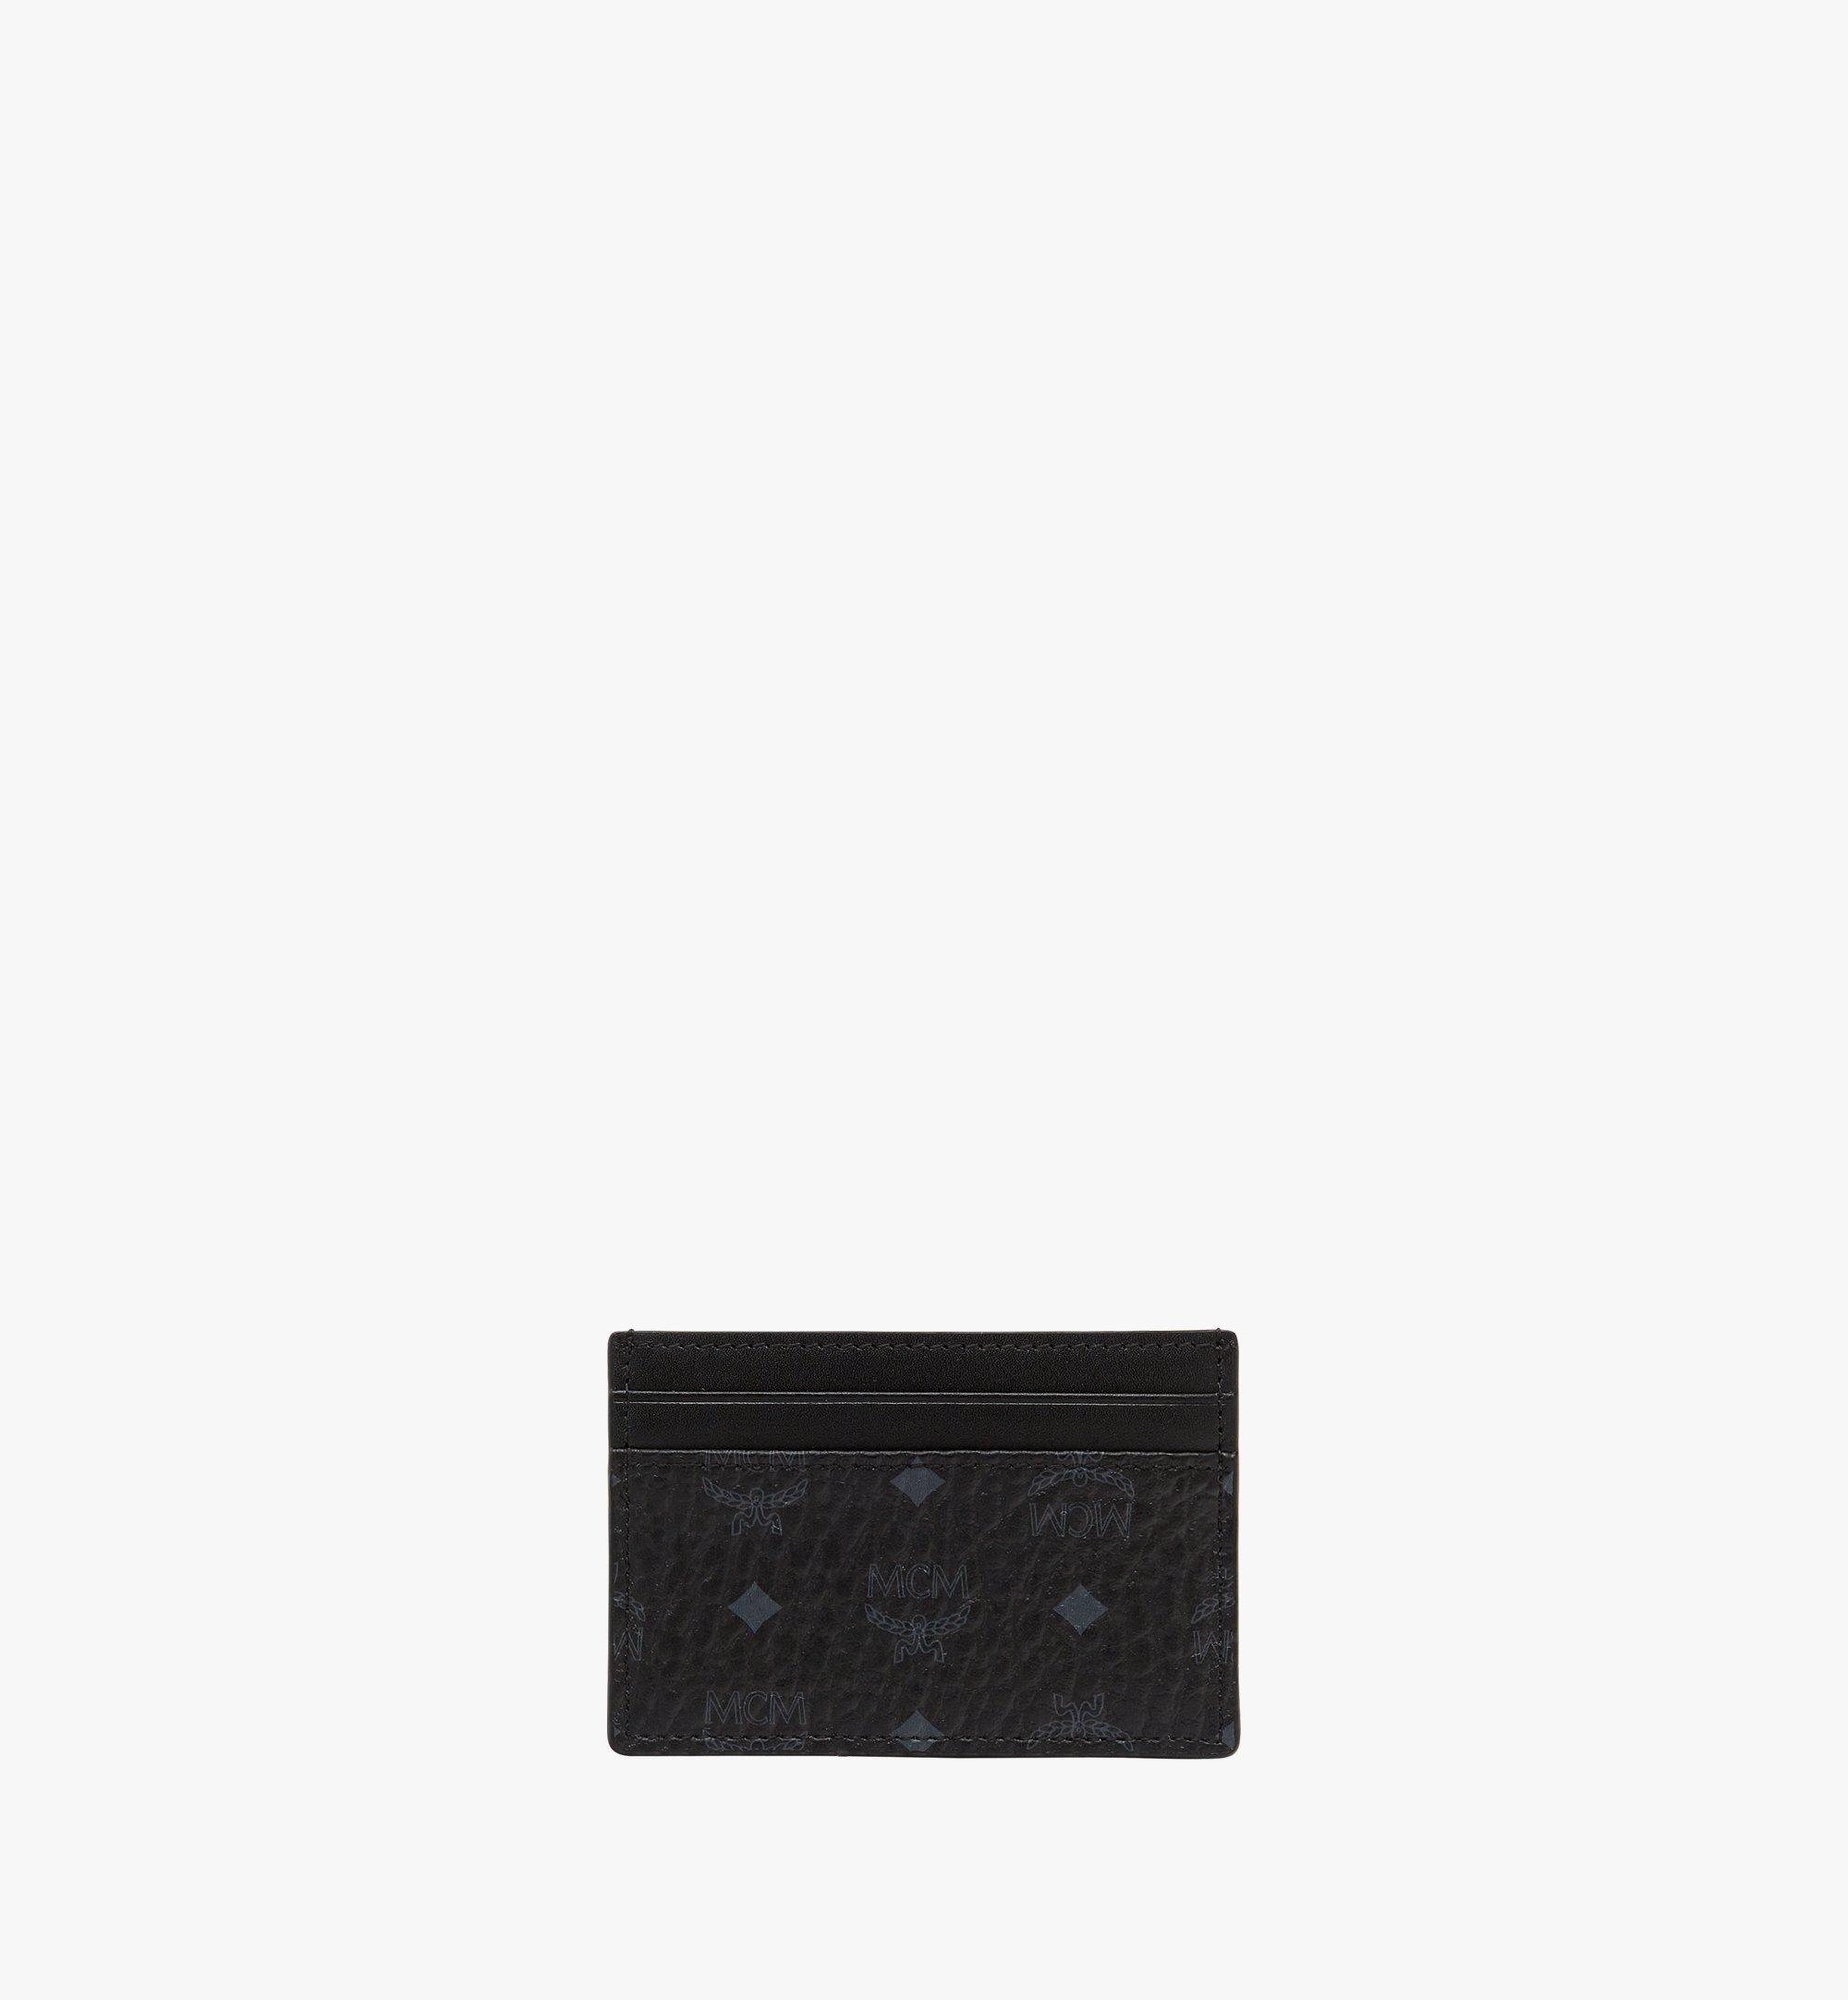 MCM Kartenetui in Visetos Original Black MXAAAVI01BK001 Noch mehr sehen 3